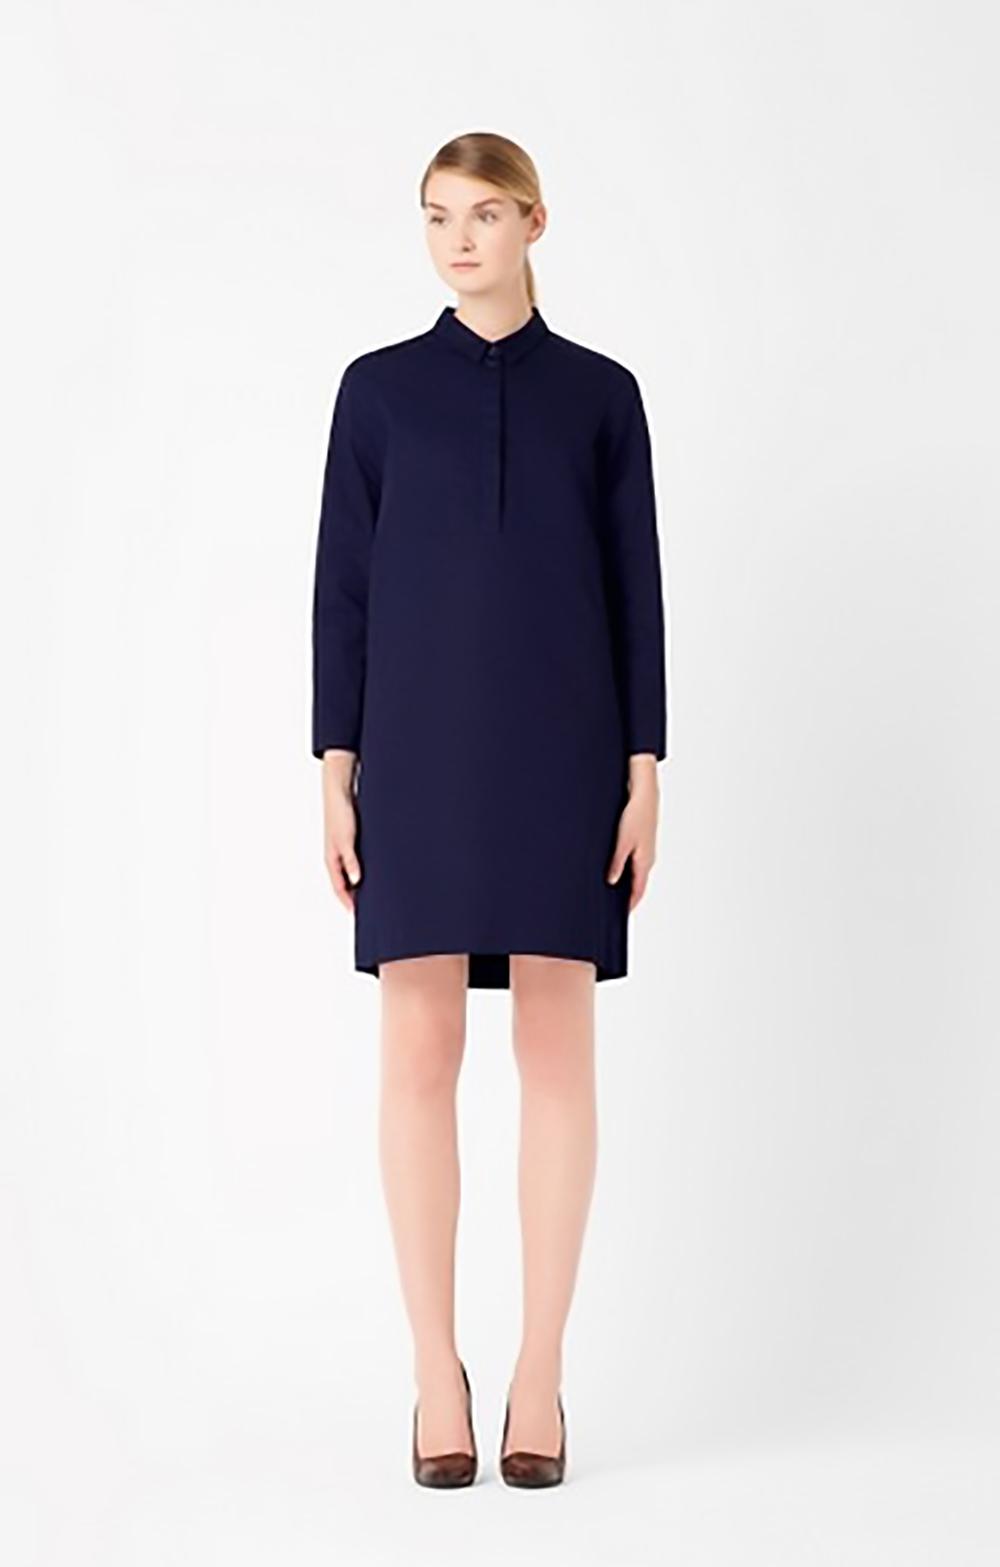 cos twill shirt dress COS 1500.jpg